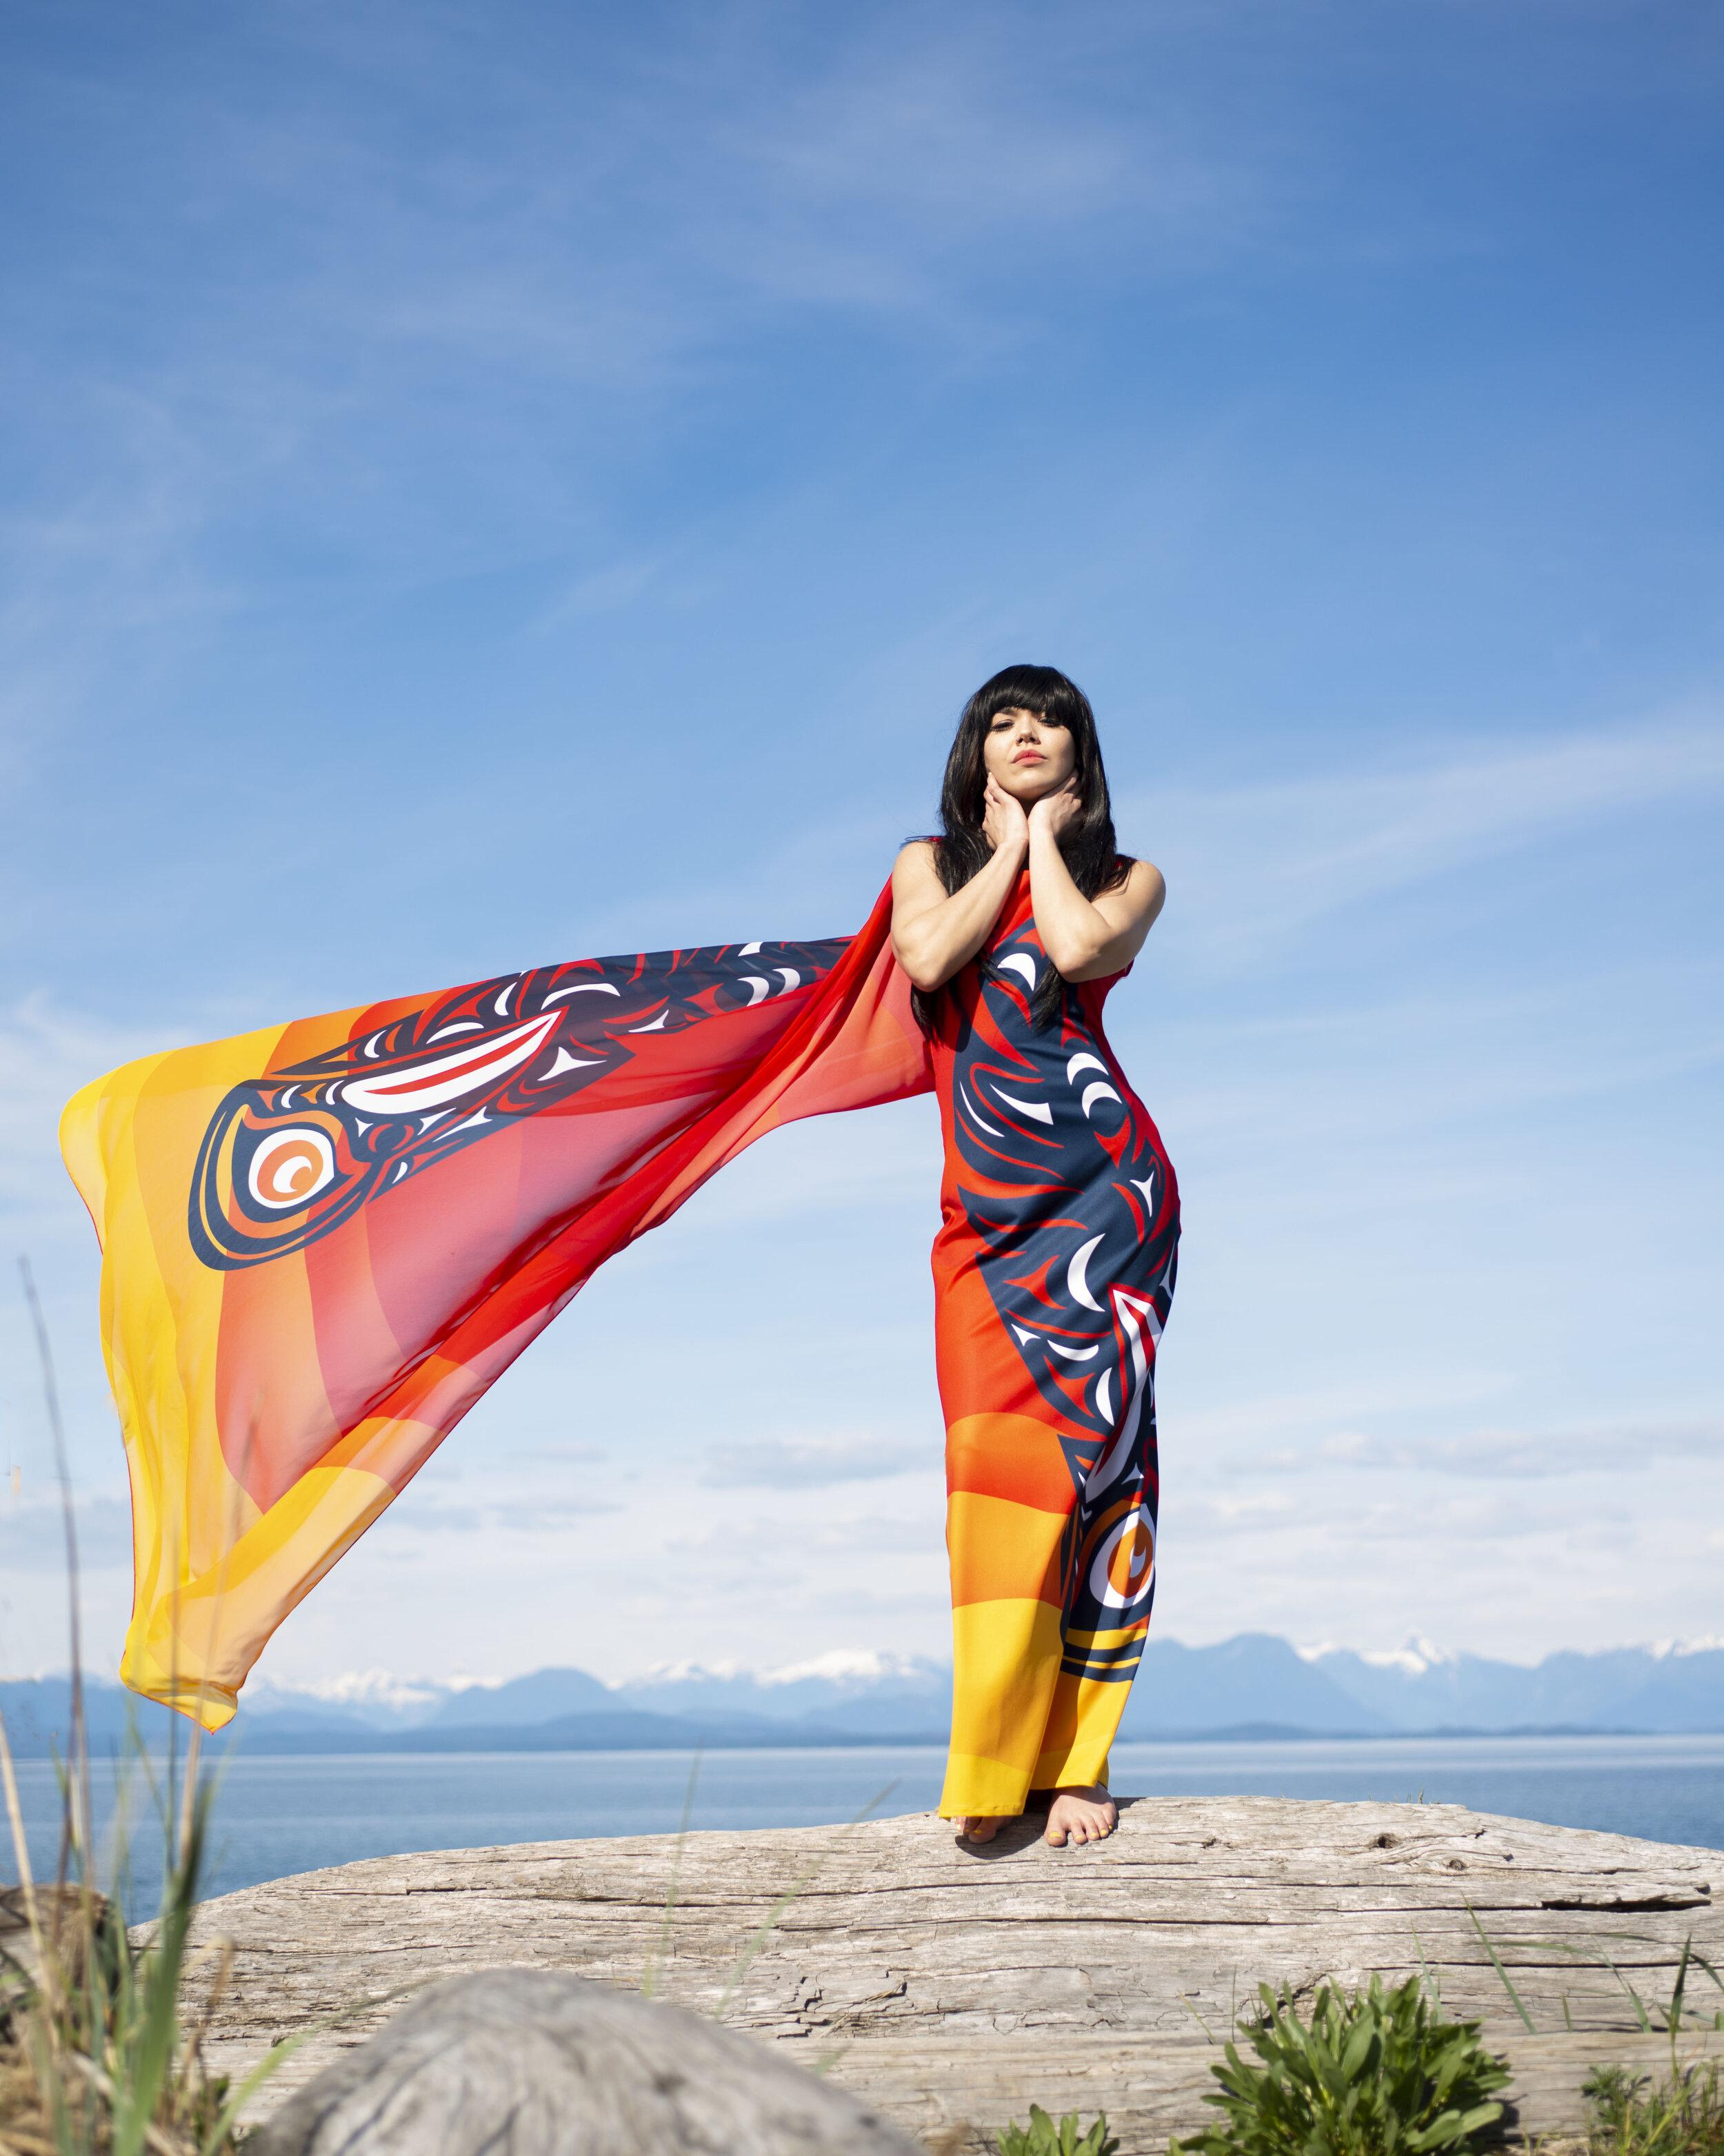 Ay Lelum - Nanaimo, Canada based designers